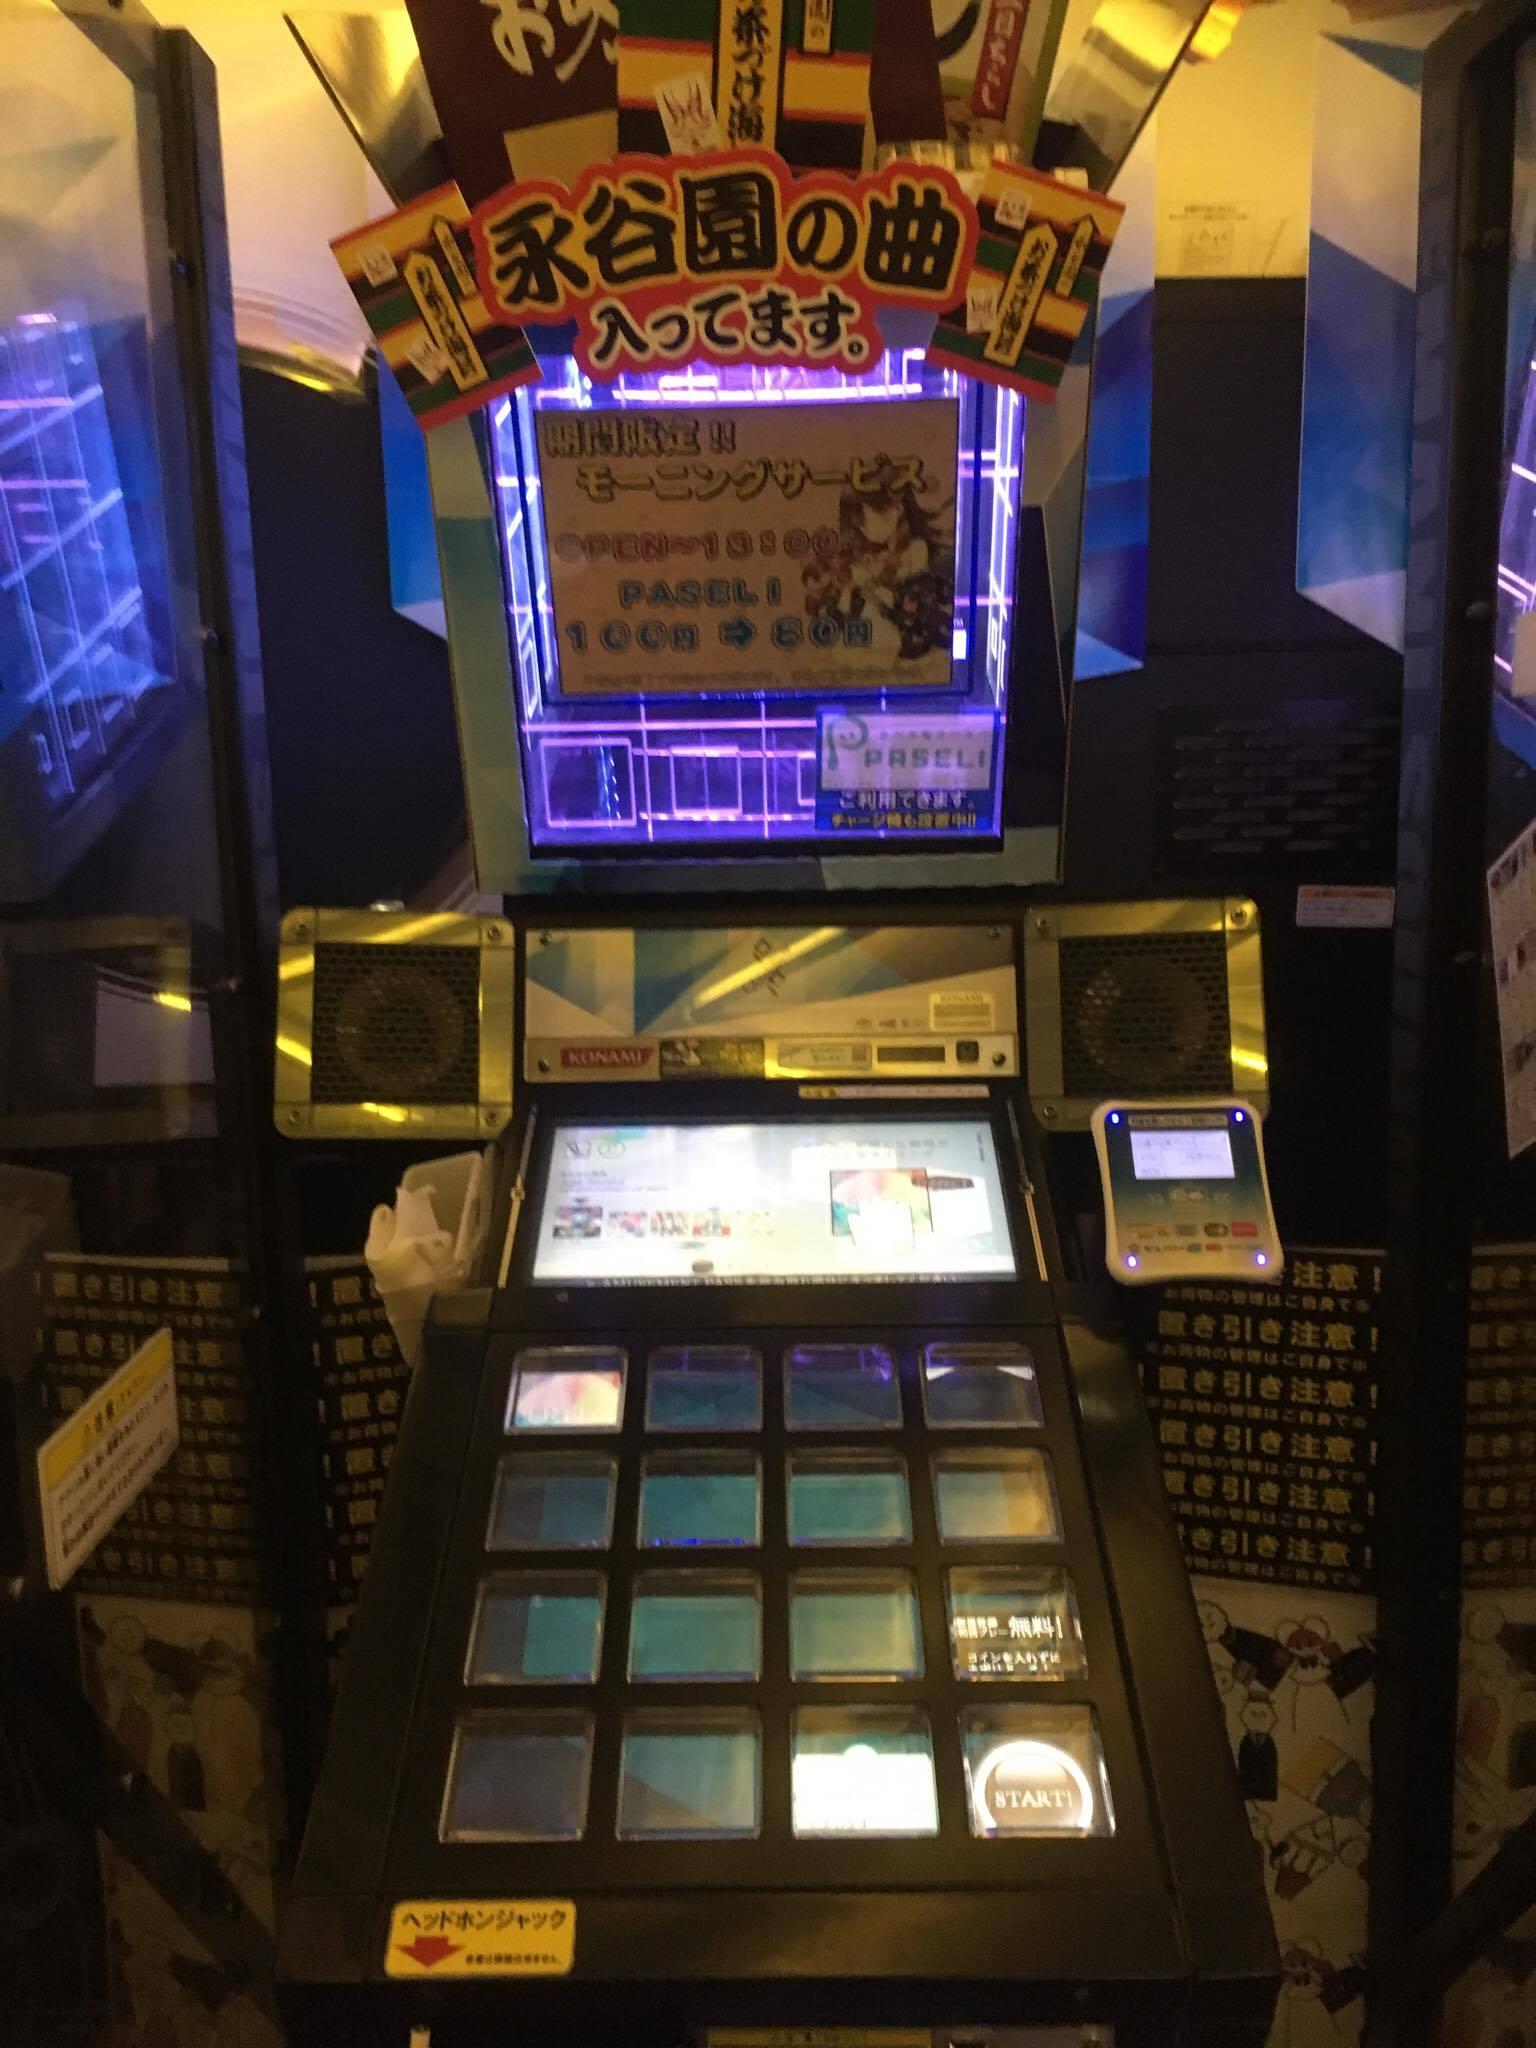 Japanese Arcade Jungle: Putting the